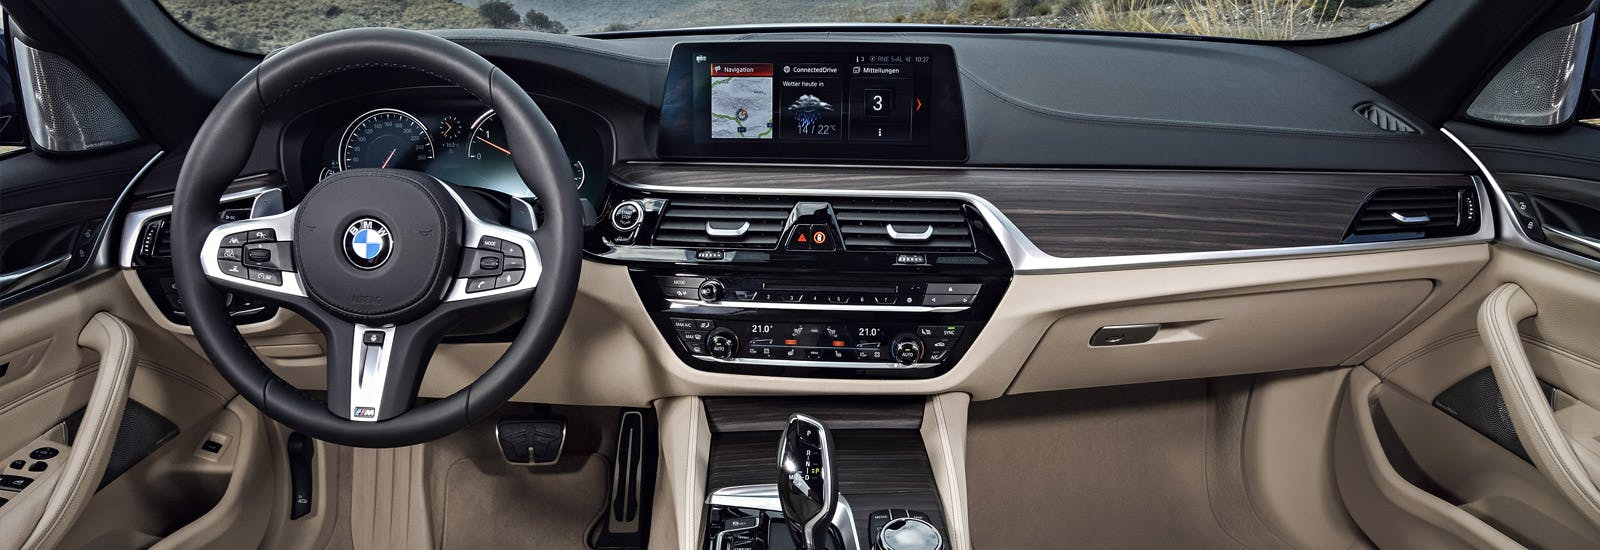 2018 gmc interior new car release date and review 2018 amanda felicia. Black Bedroom Furniture Sets. Home Design Ideas